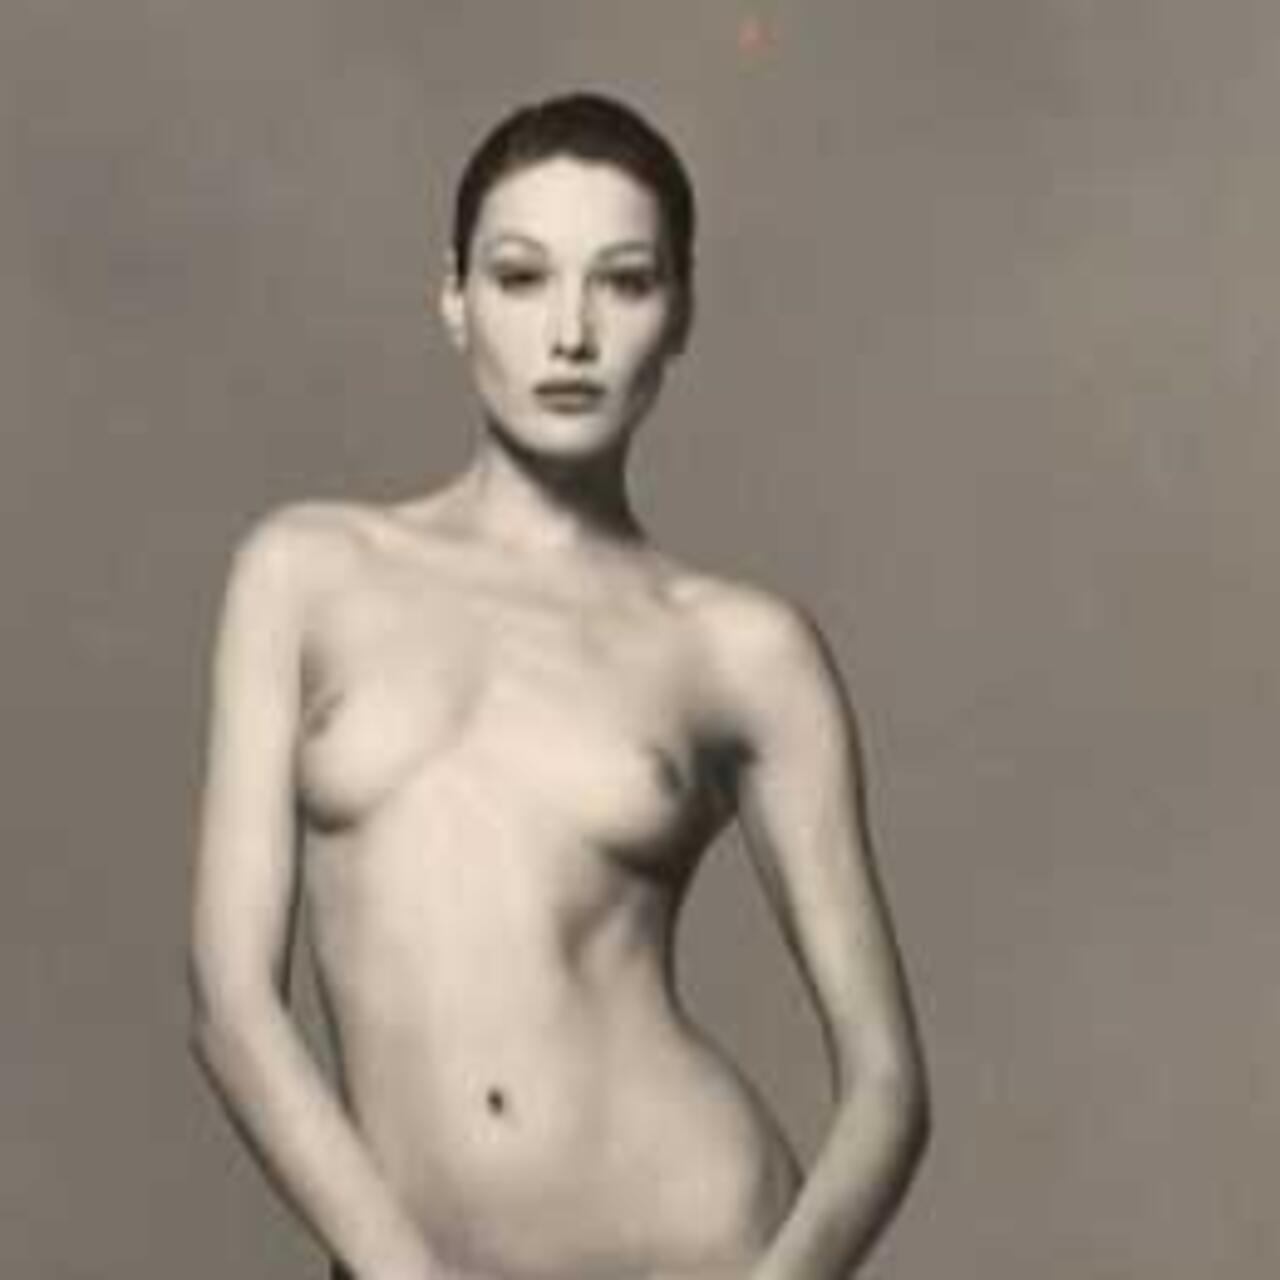 Bruni naked carla Nude Photos